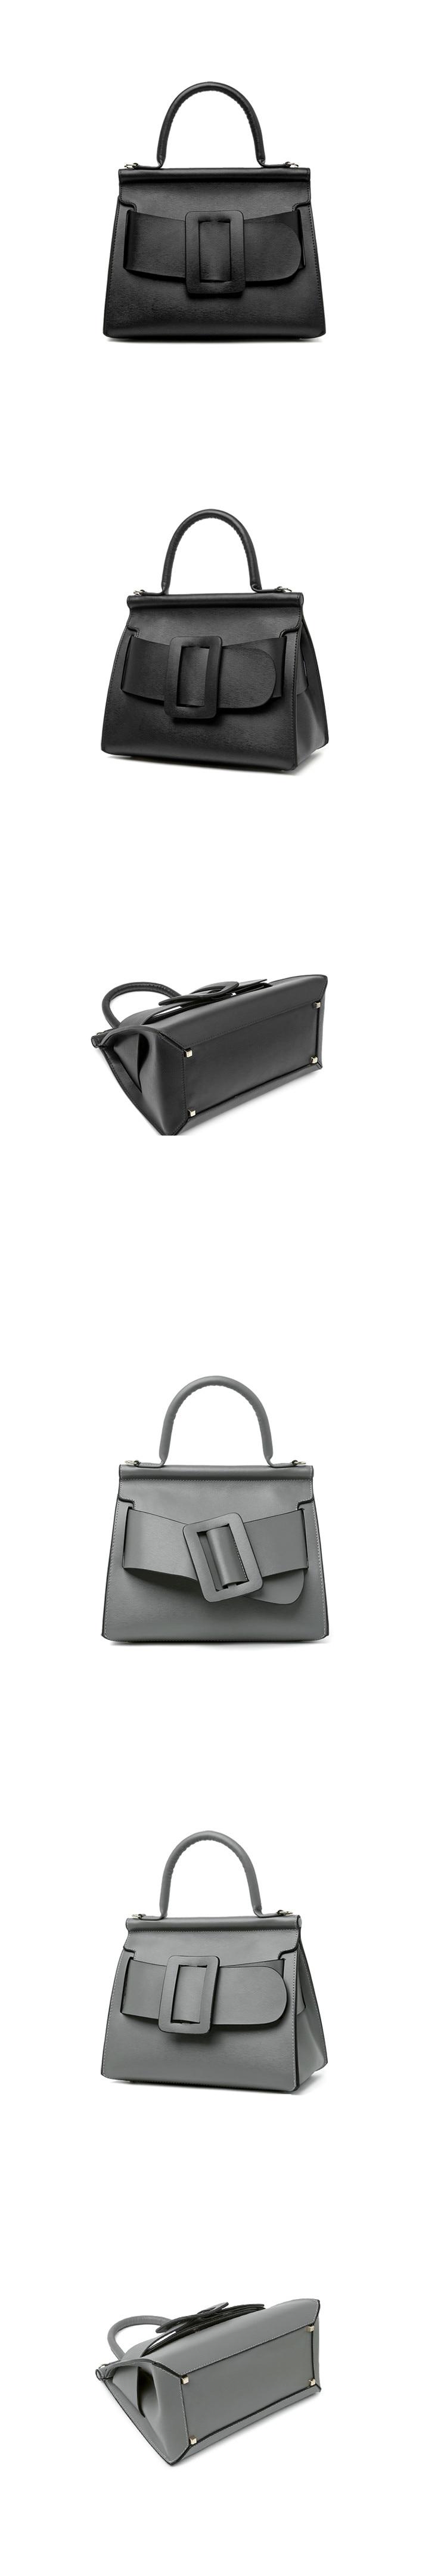 Famous Brand Designer Handbag Genuine Leather Women Vintage Bark Grain Big Buckle Handle bags with strap belt Boyy (12)_